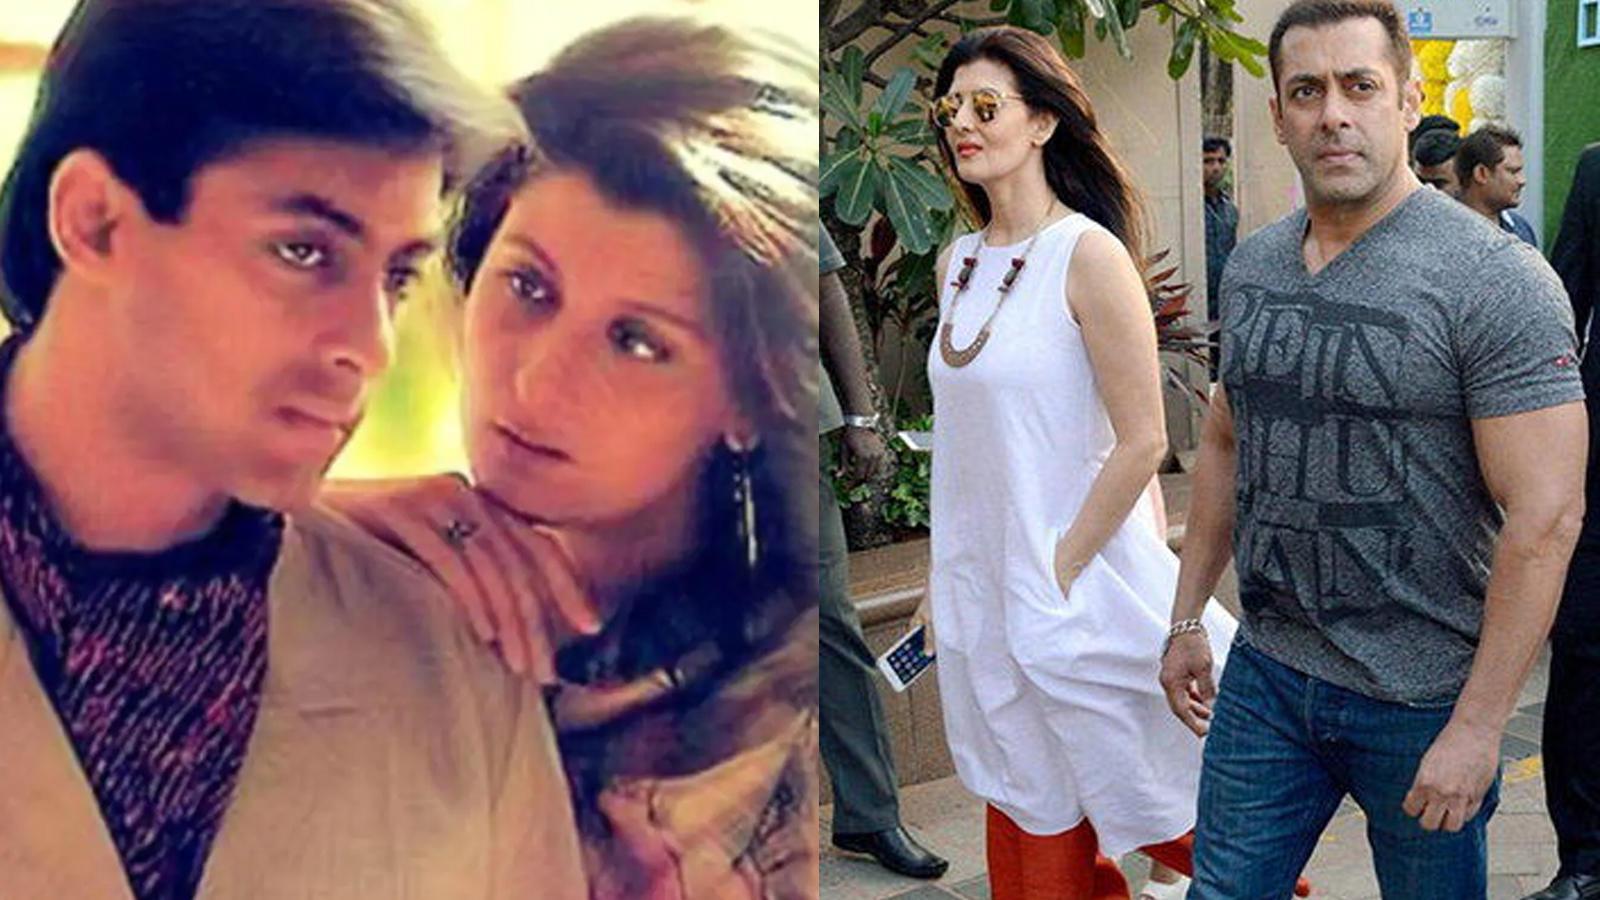 salman-khan-to-bring-ex-girlfriend-sangeeta-bijlani-in-nach-baliye-9-as-judge